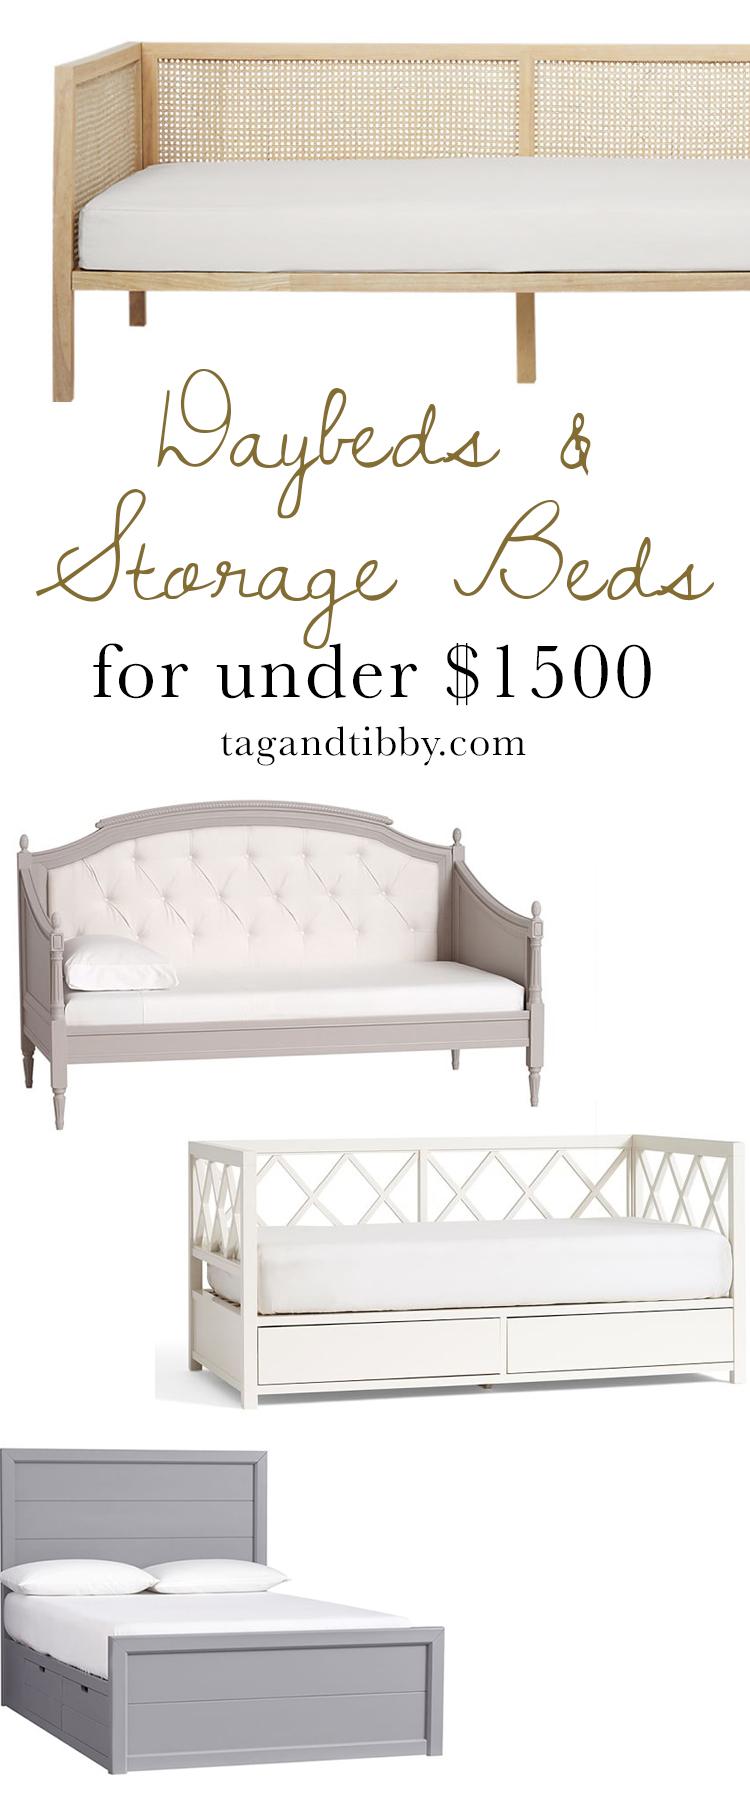 Daybeds & Storage Beds for Tweens priced under $1.5k